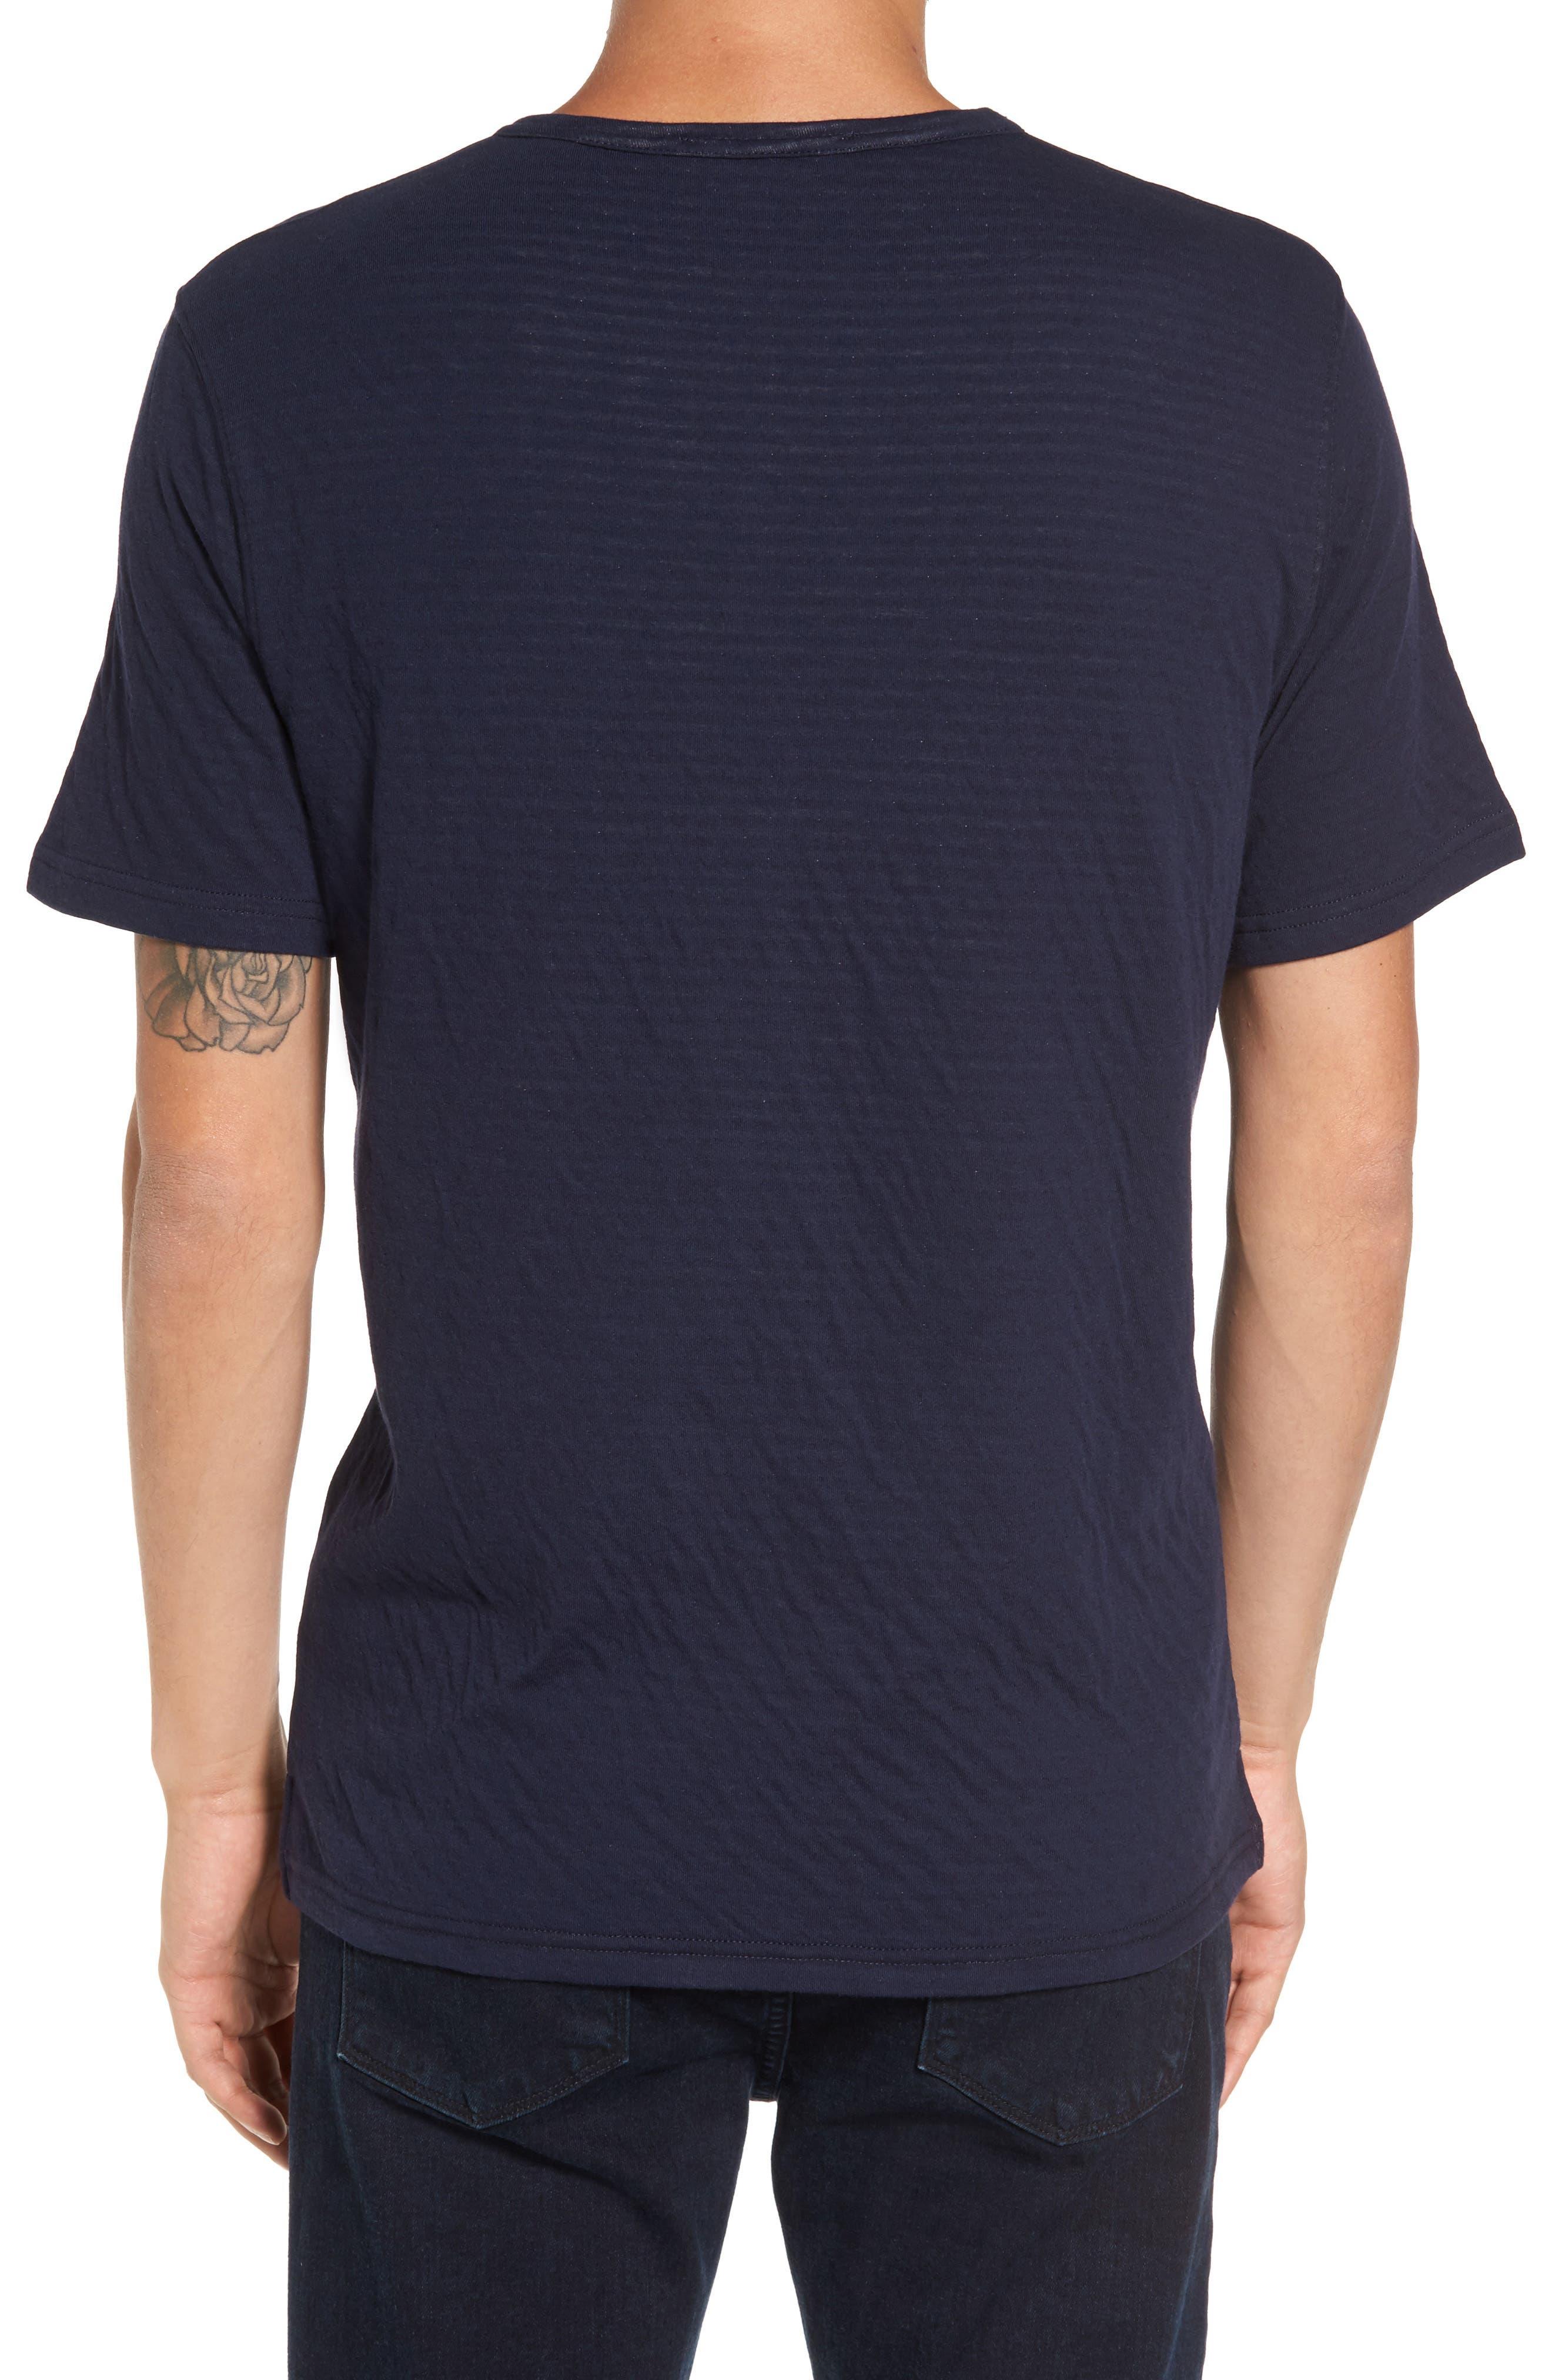 Striped Pocket T-Shirt,                             Alternate thumbnail 2, color,                             Navy/ White Stripe